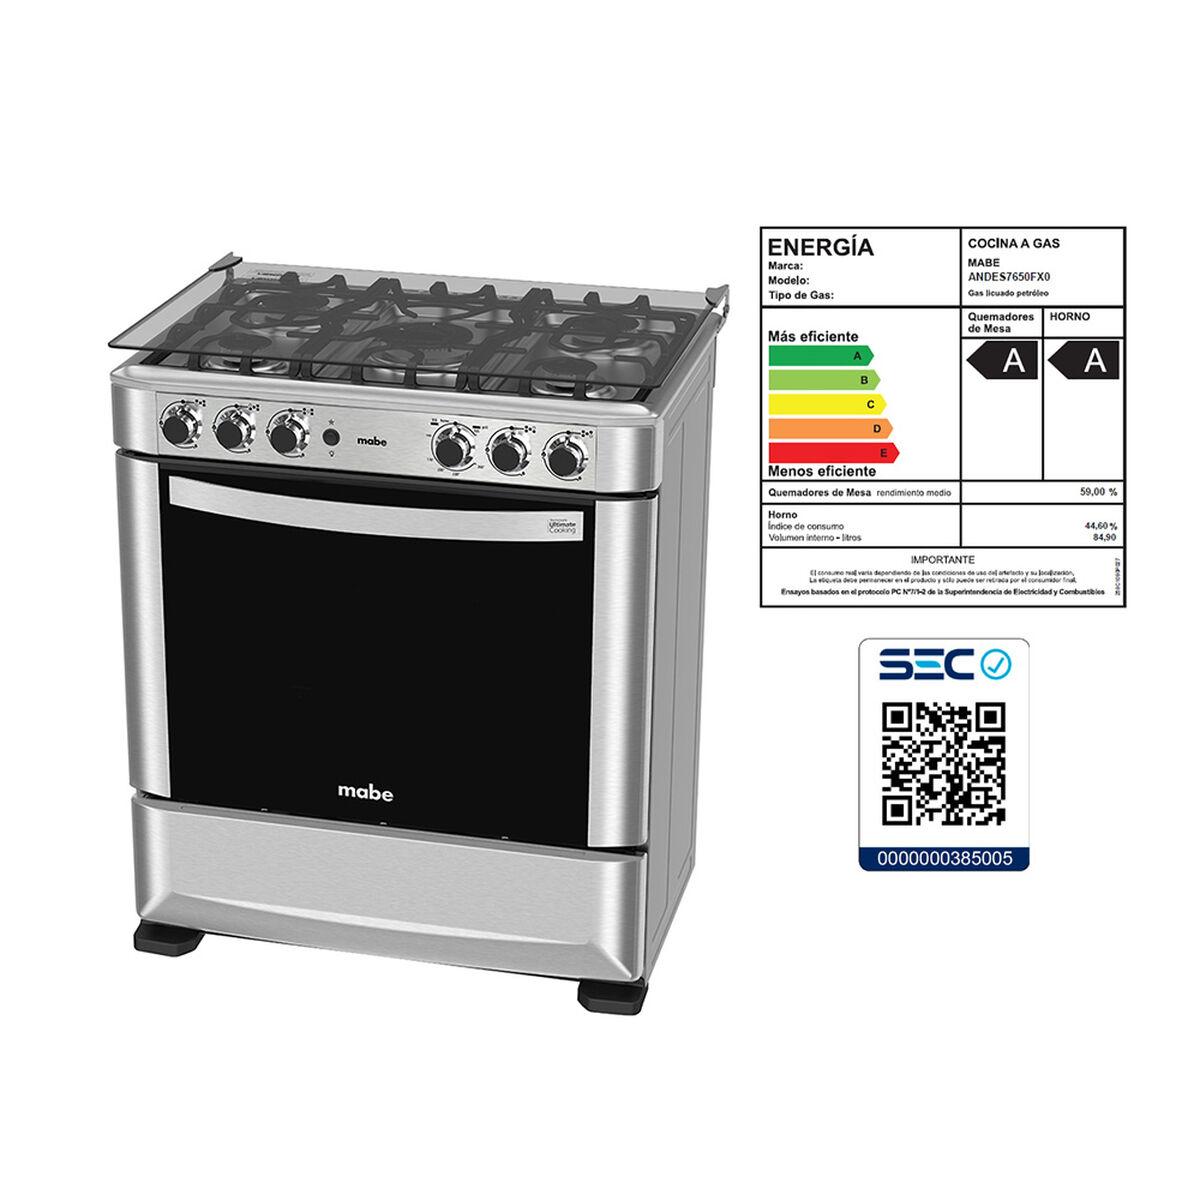 Cocina a Gas Mabe Andes7650F 5 Quemadores